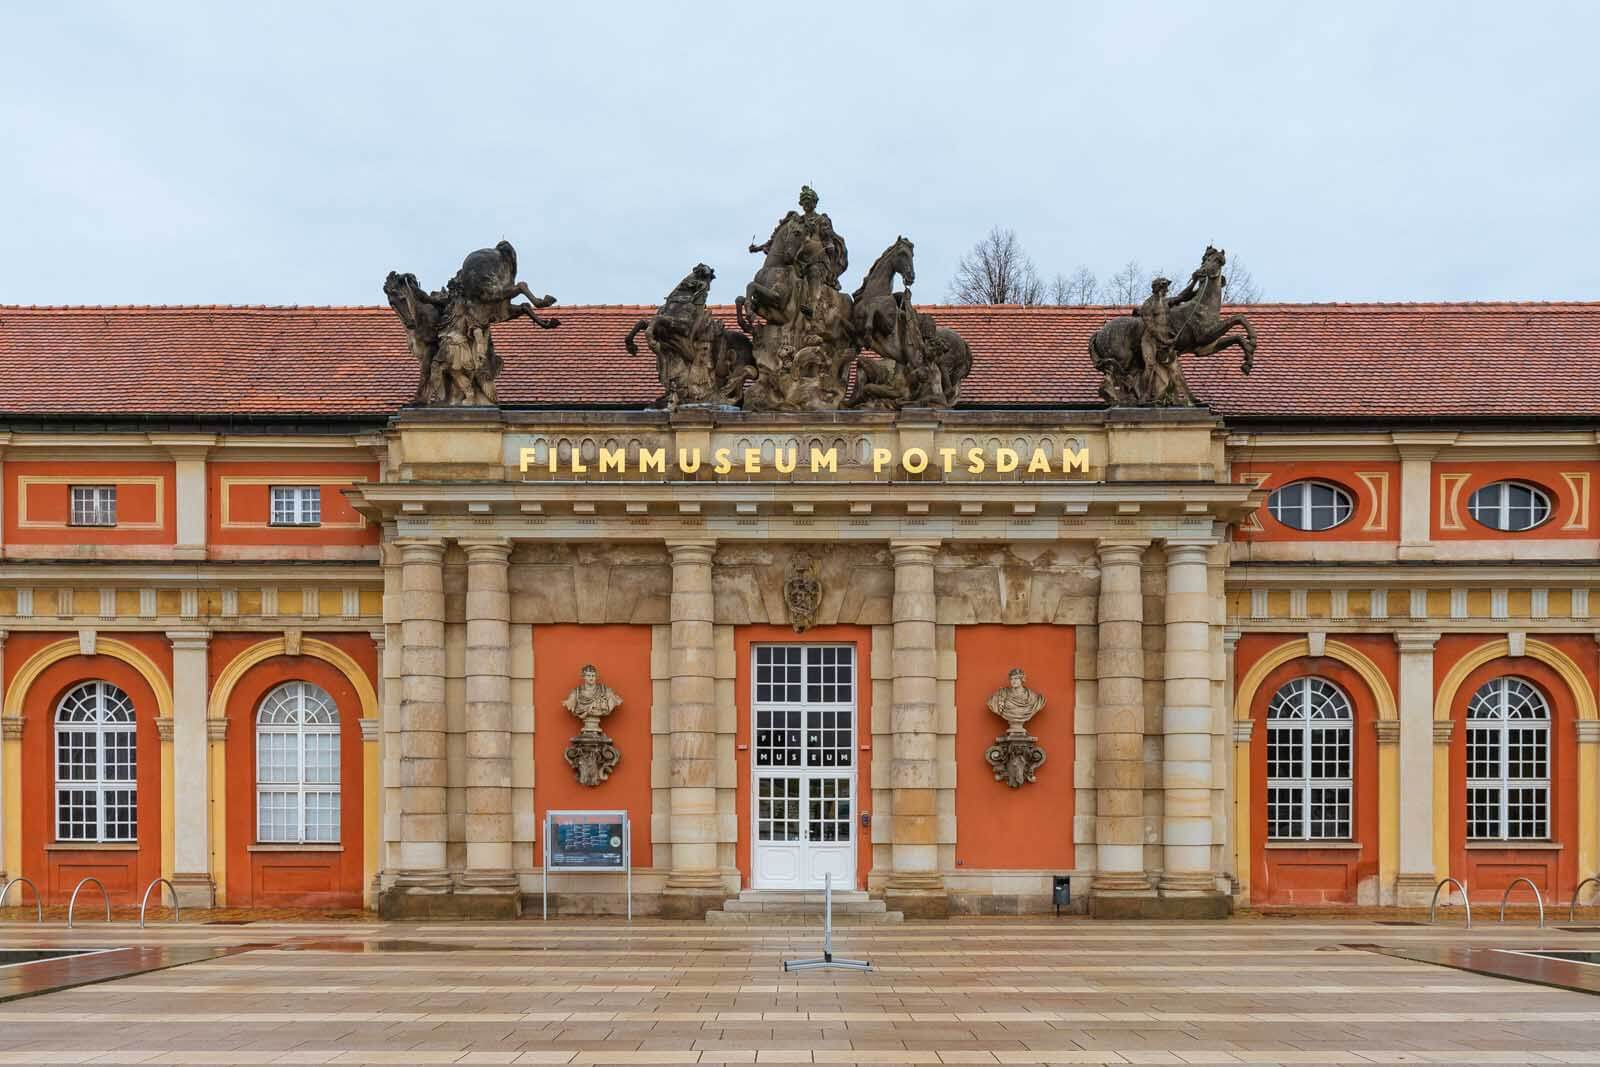 FilmMuseum in Potsdam Germany